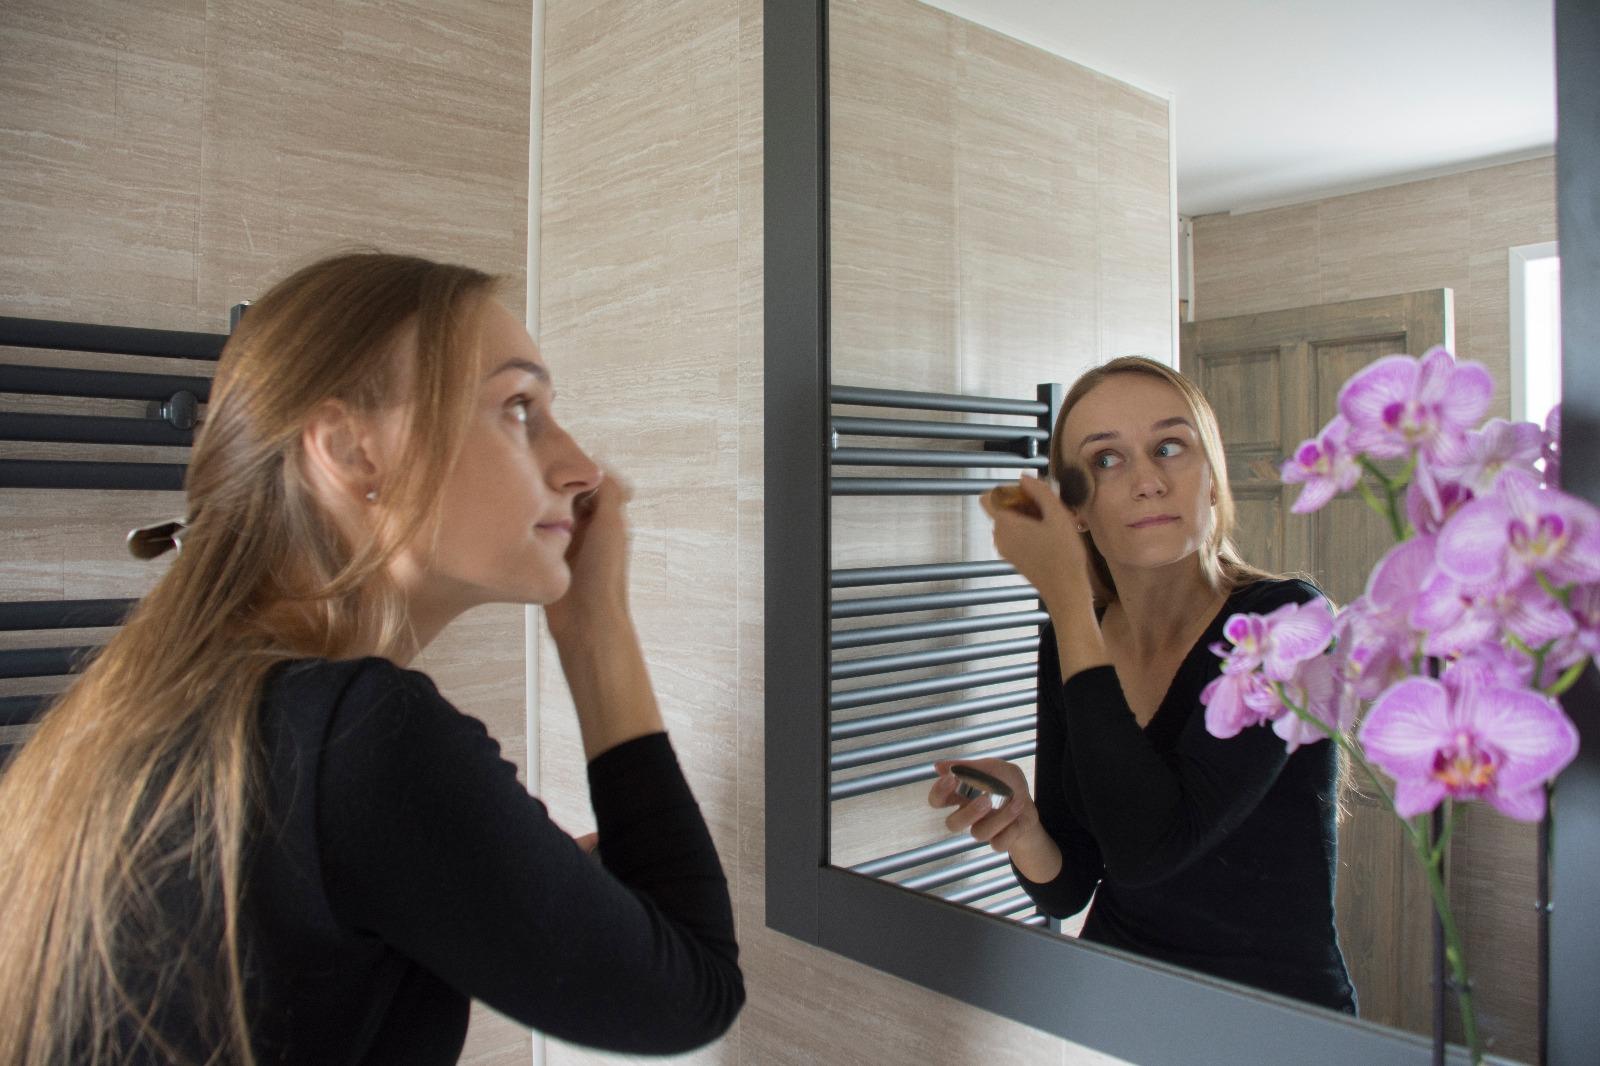 naturali dekoratyvine kosmetika